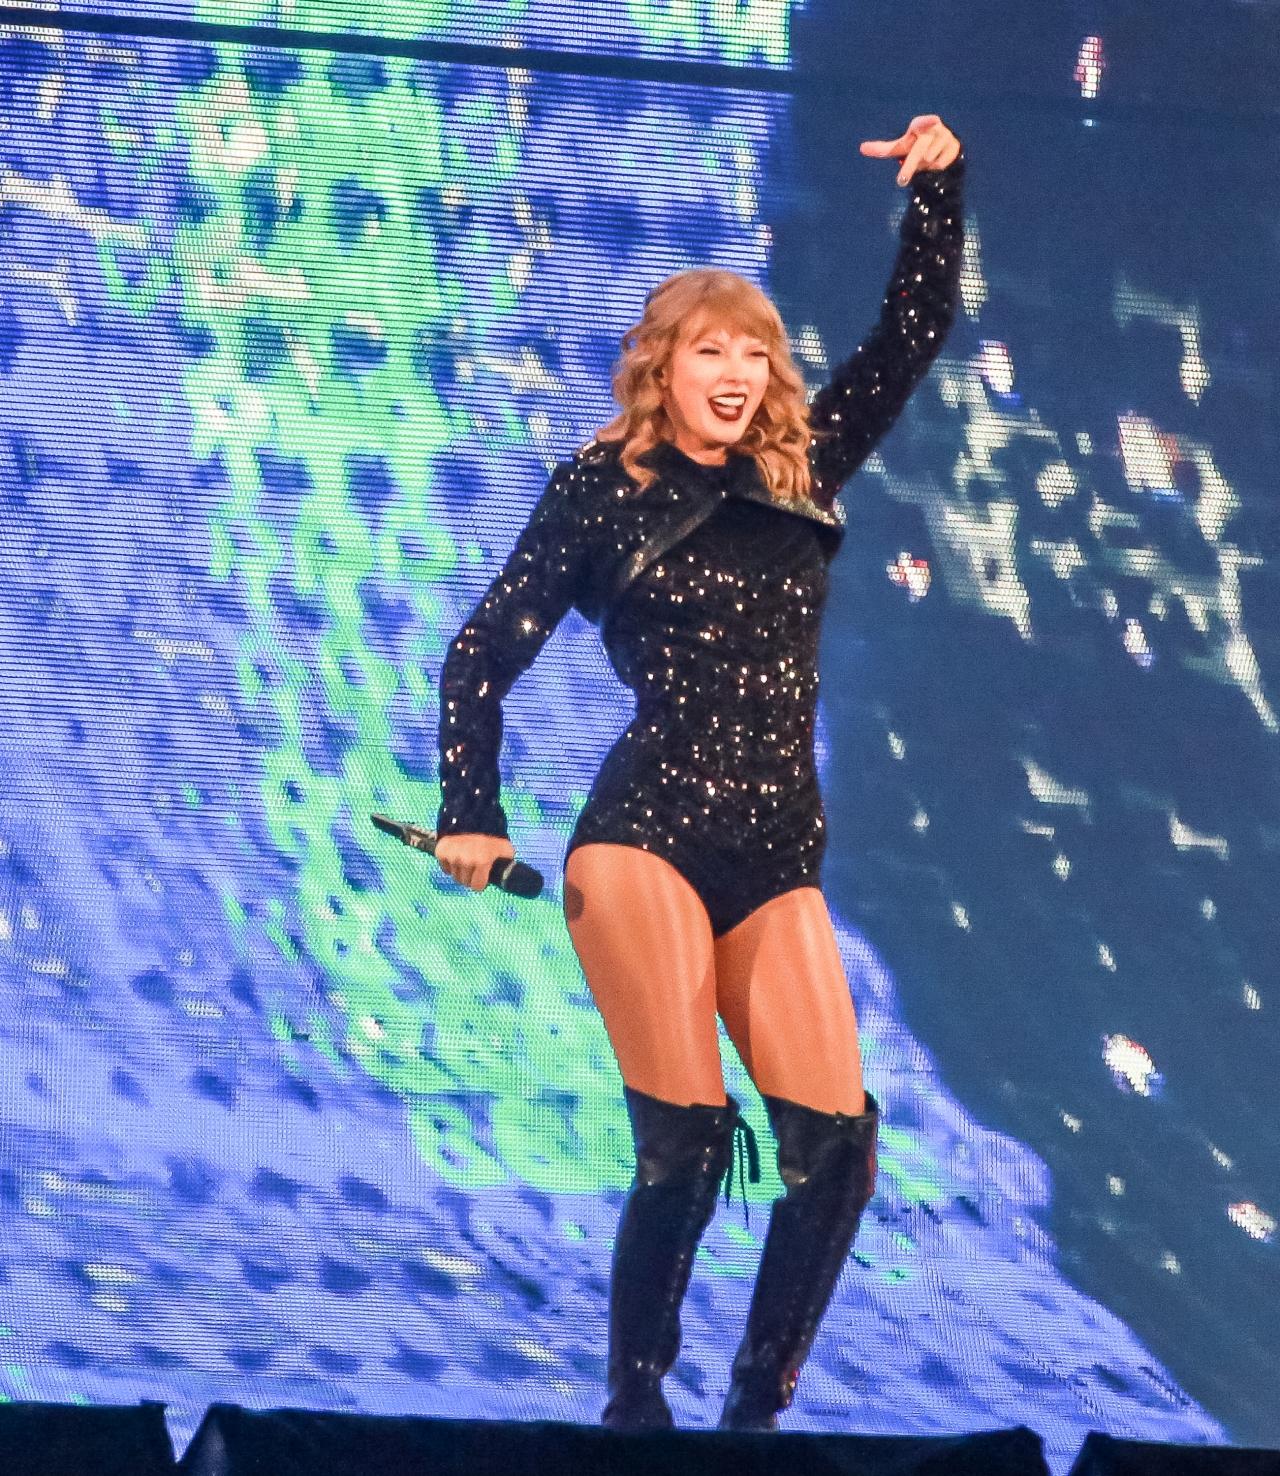 Taylor Swift Reputation Tour ConcertPhotos